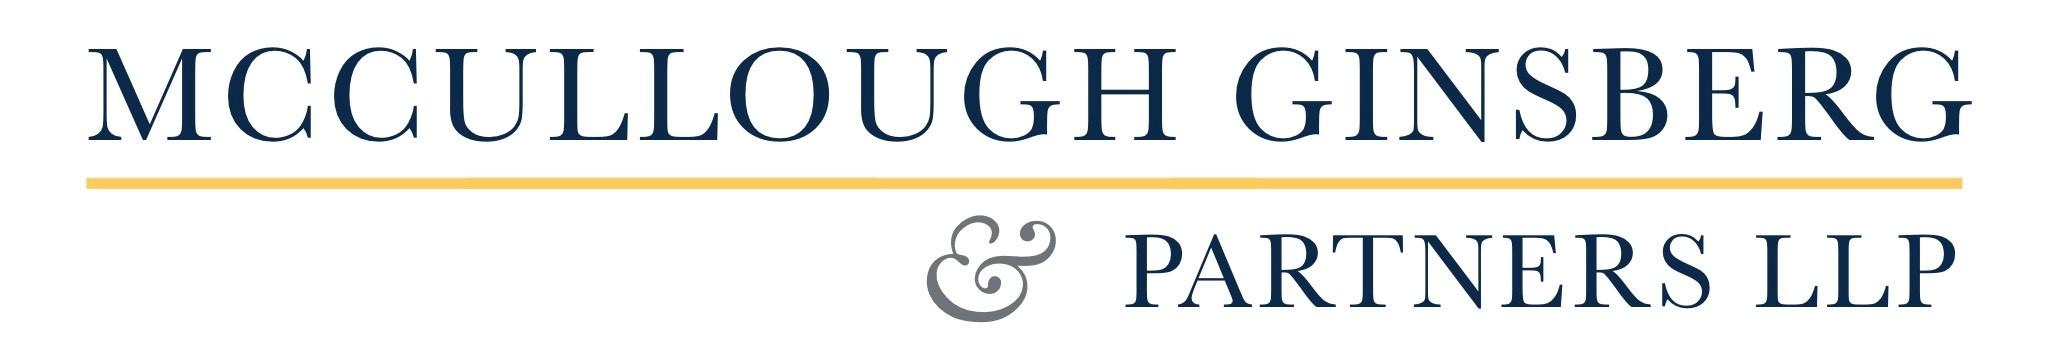 McCullough Ginsberg & Partners LLP